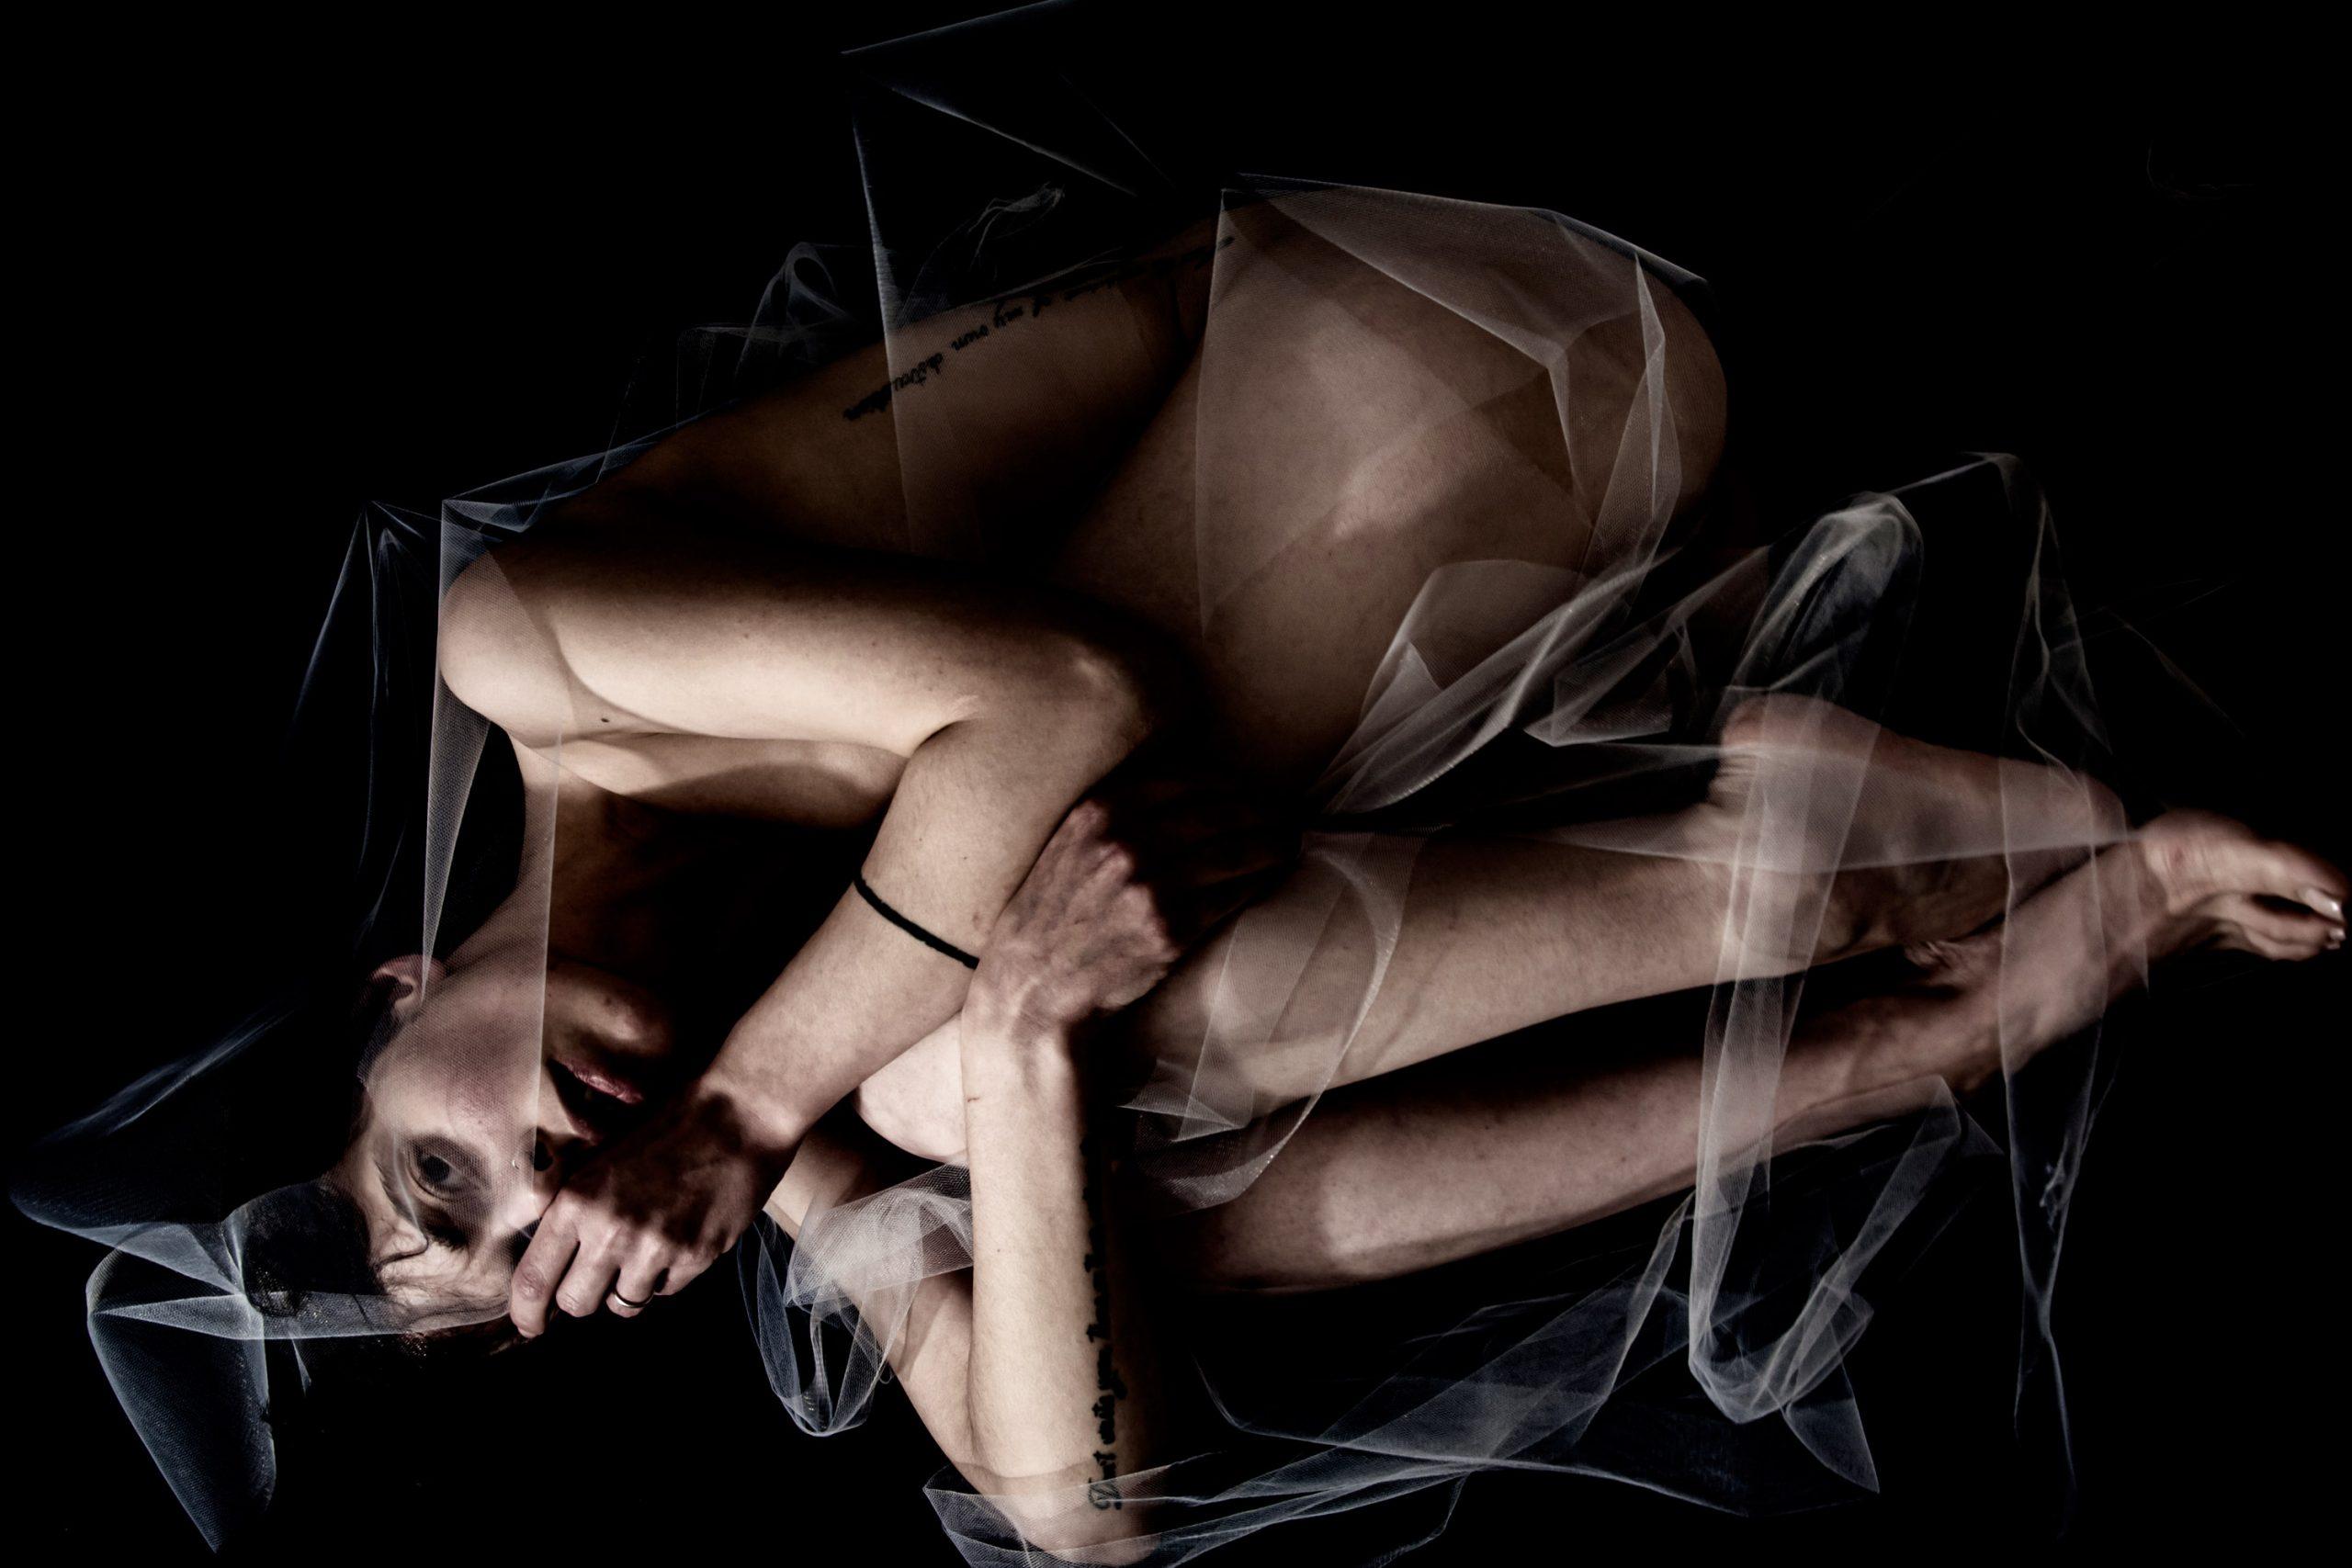 Categorie: Boudoir & Artistic Nude, Fashion, Fine Art, Glamour, Portrait - Ph. & Model: LuceNuda - Models: JESSICA PADUANO & HERMES PRENCIPE - Location: Chieti, CH, Italia